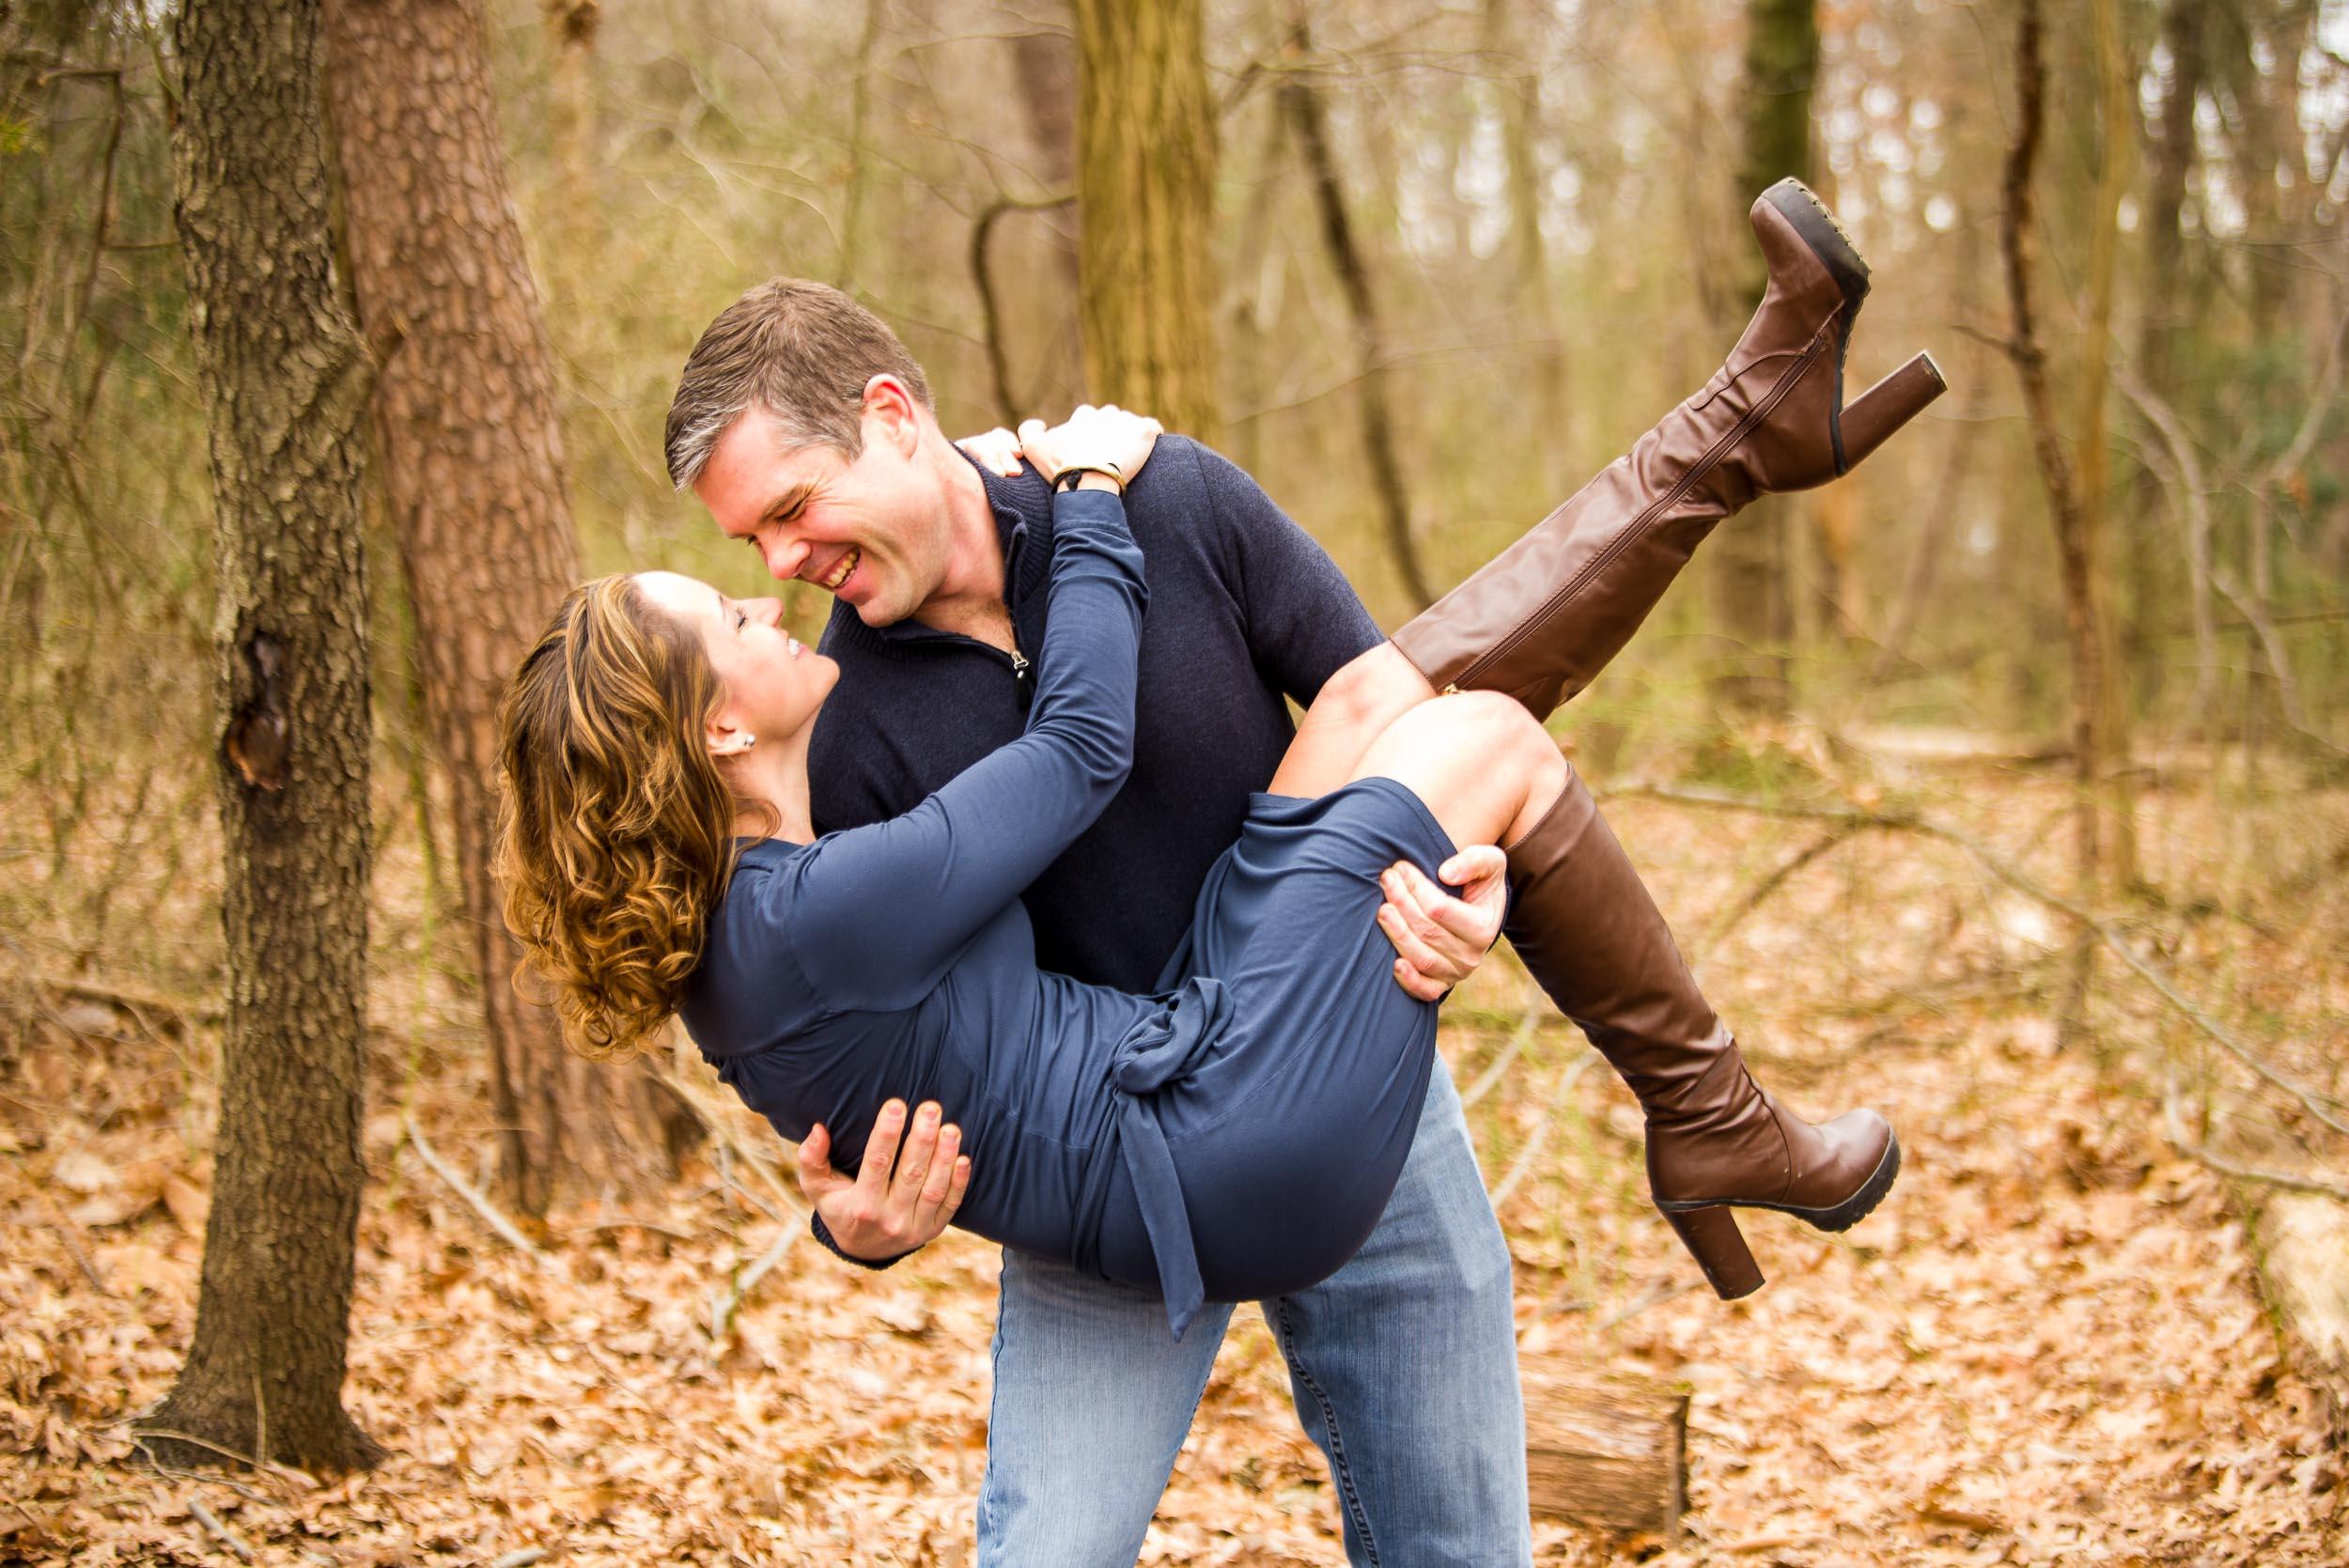 DennisSoansPhotography  Weddings Engagements Fairfax VA